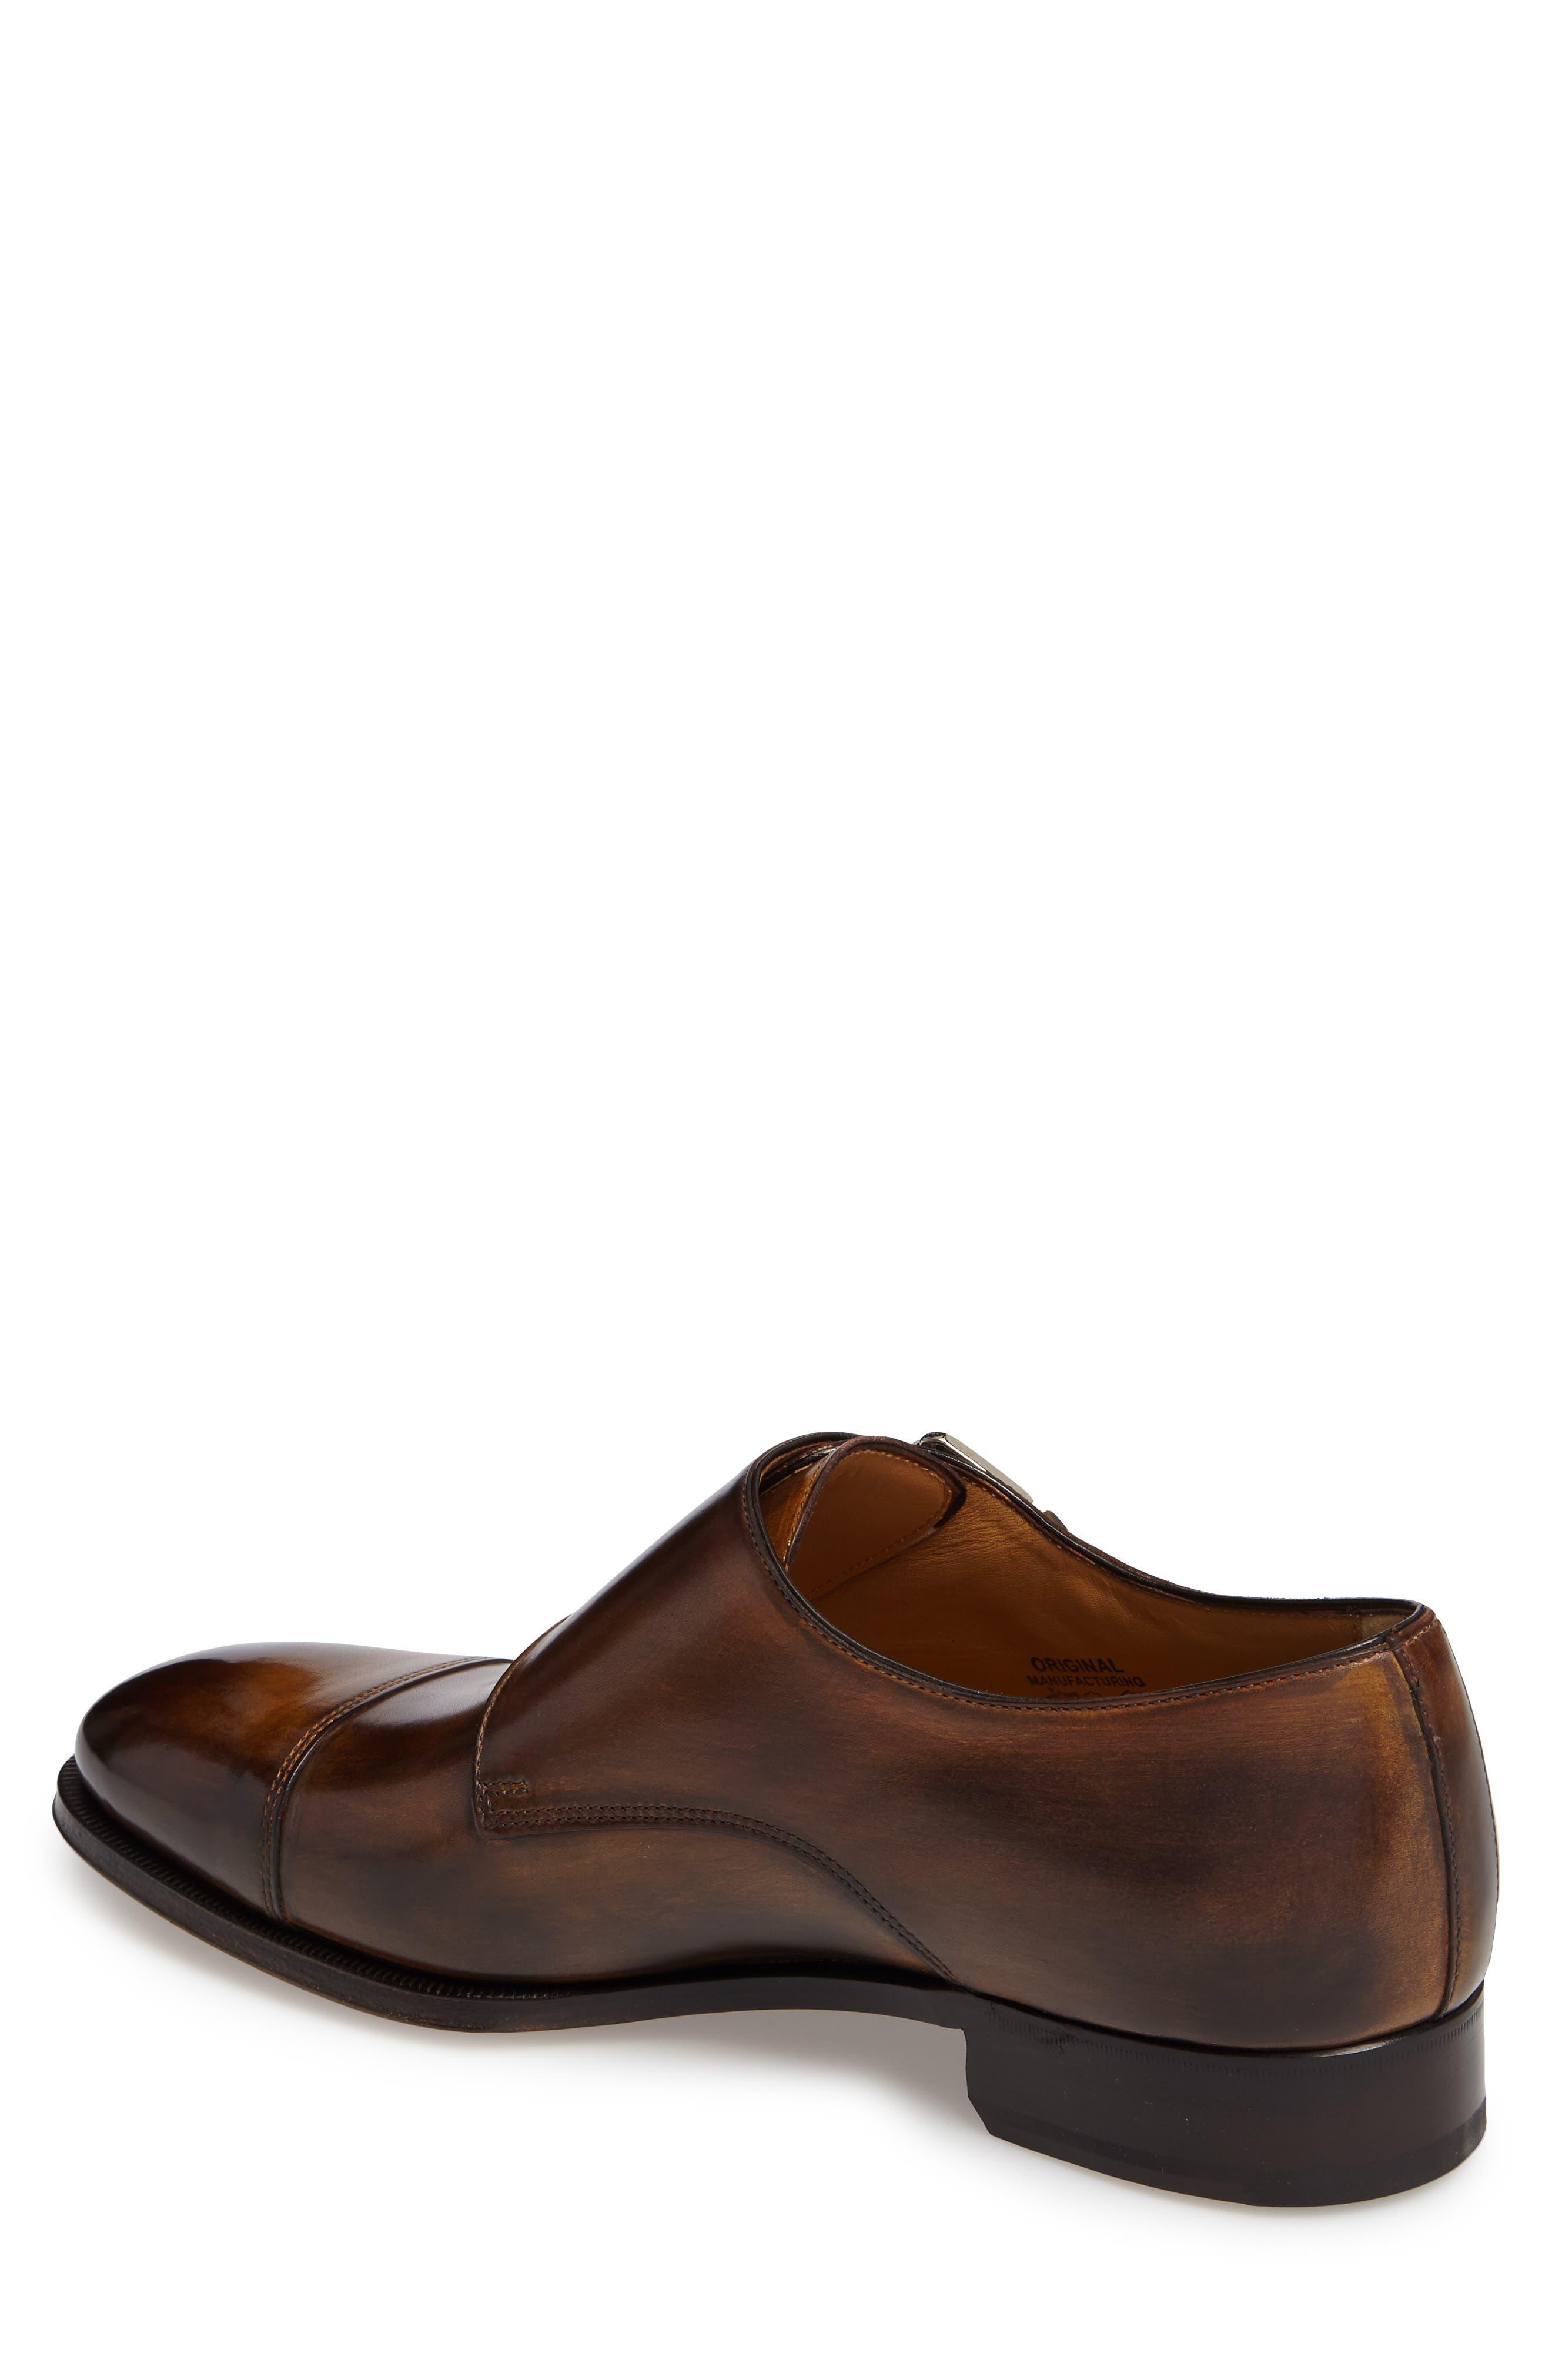 Alternate Image 2  - Di Gallo Bianco Blake Double Monk Strap Shoe (Men)